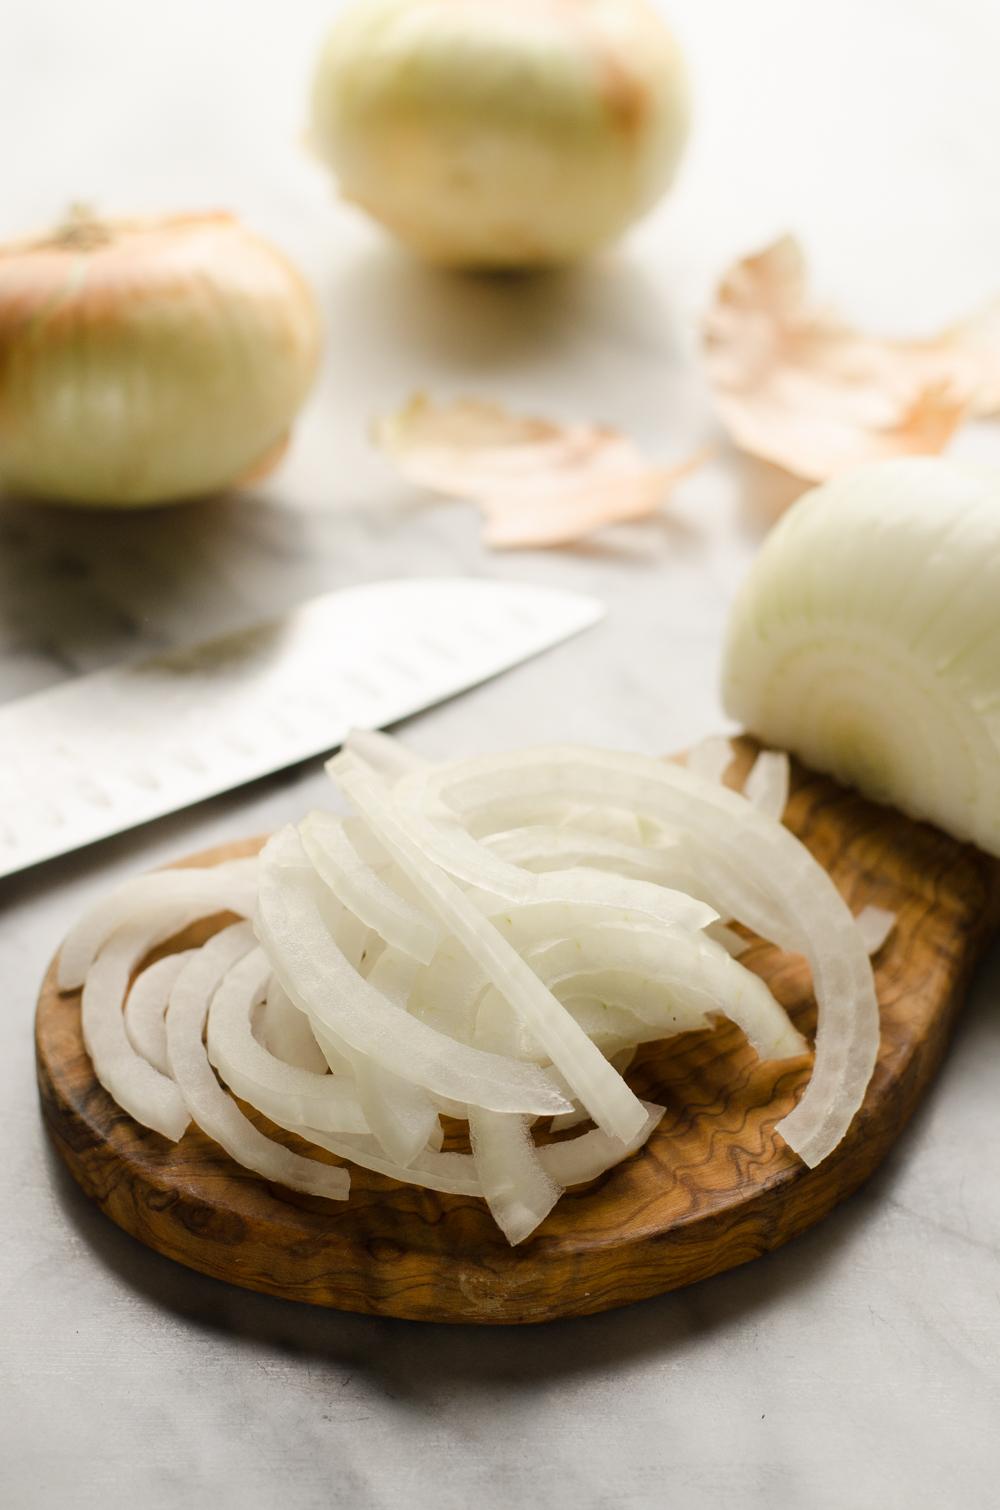 All About Vidalia Onions